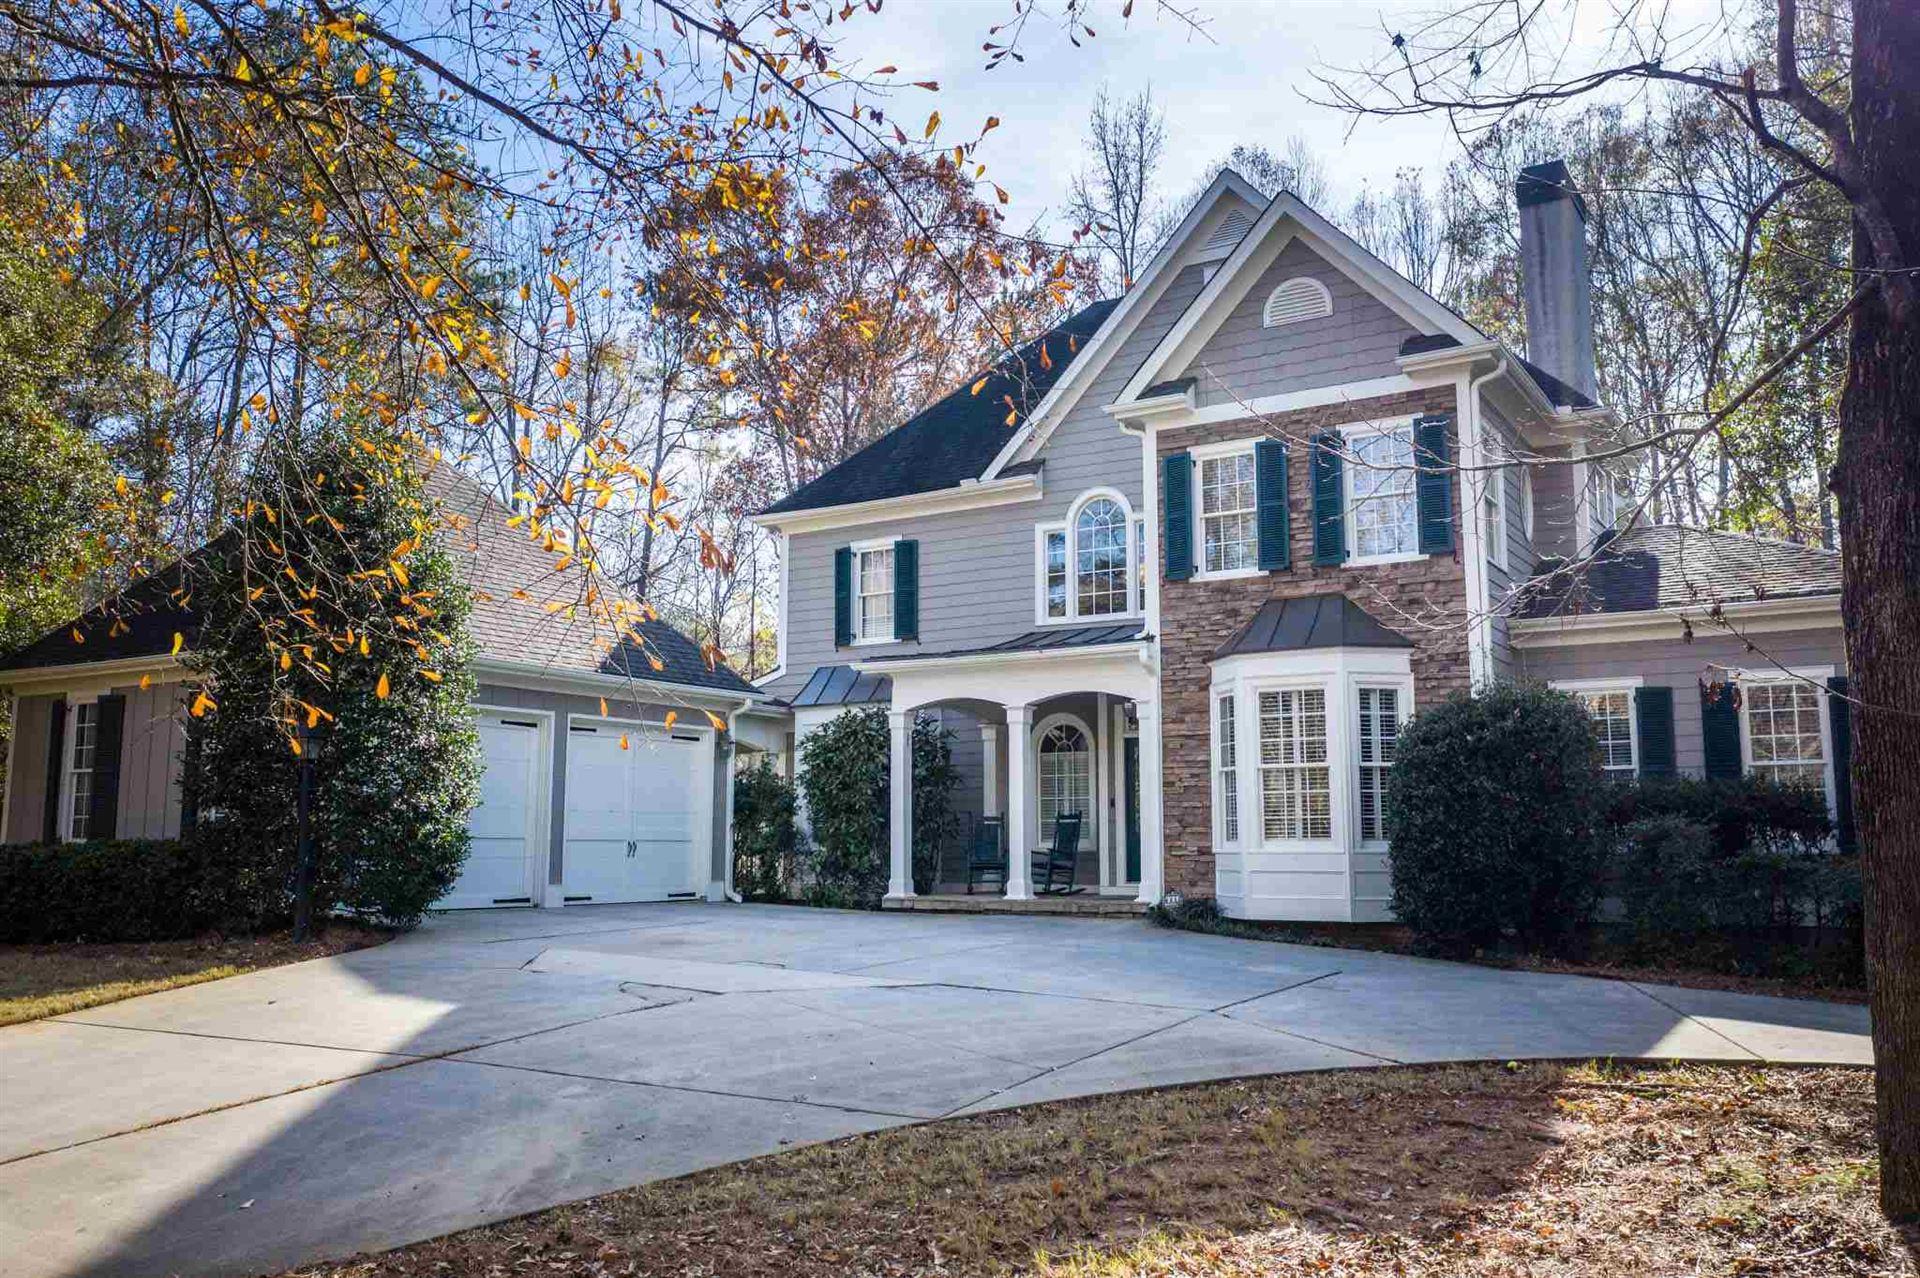 175 Colony Pt, Fayetteville, GA 30215 - #: 8901067